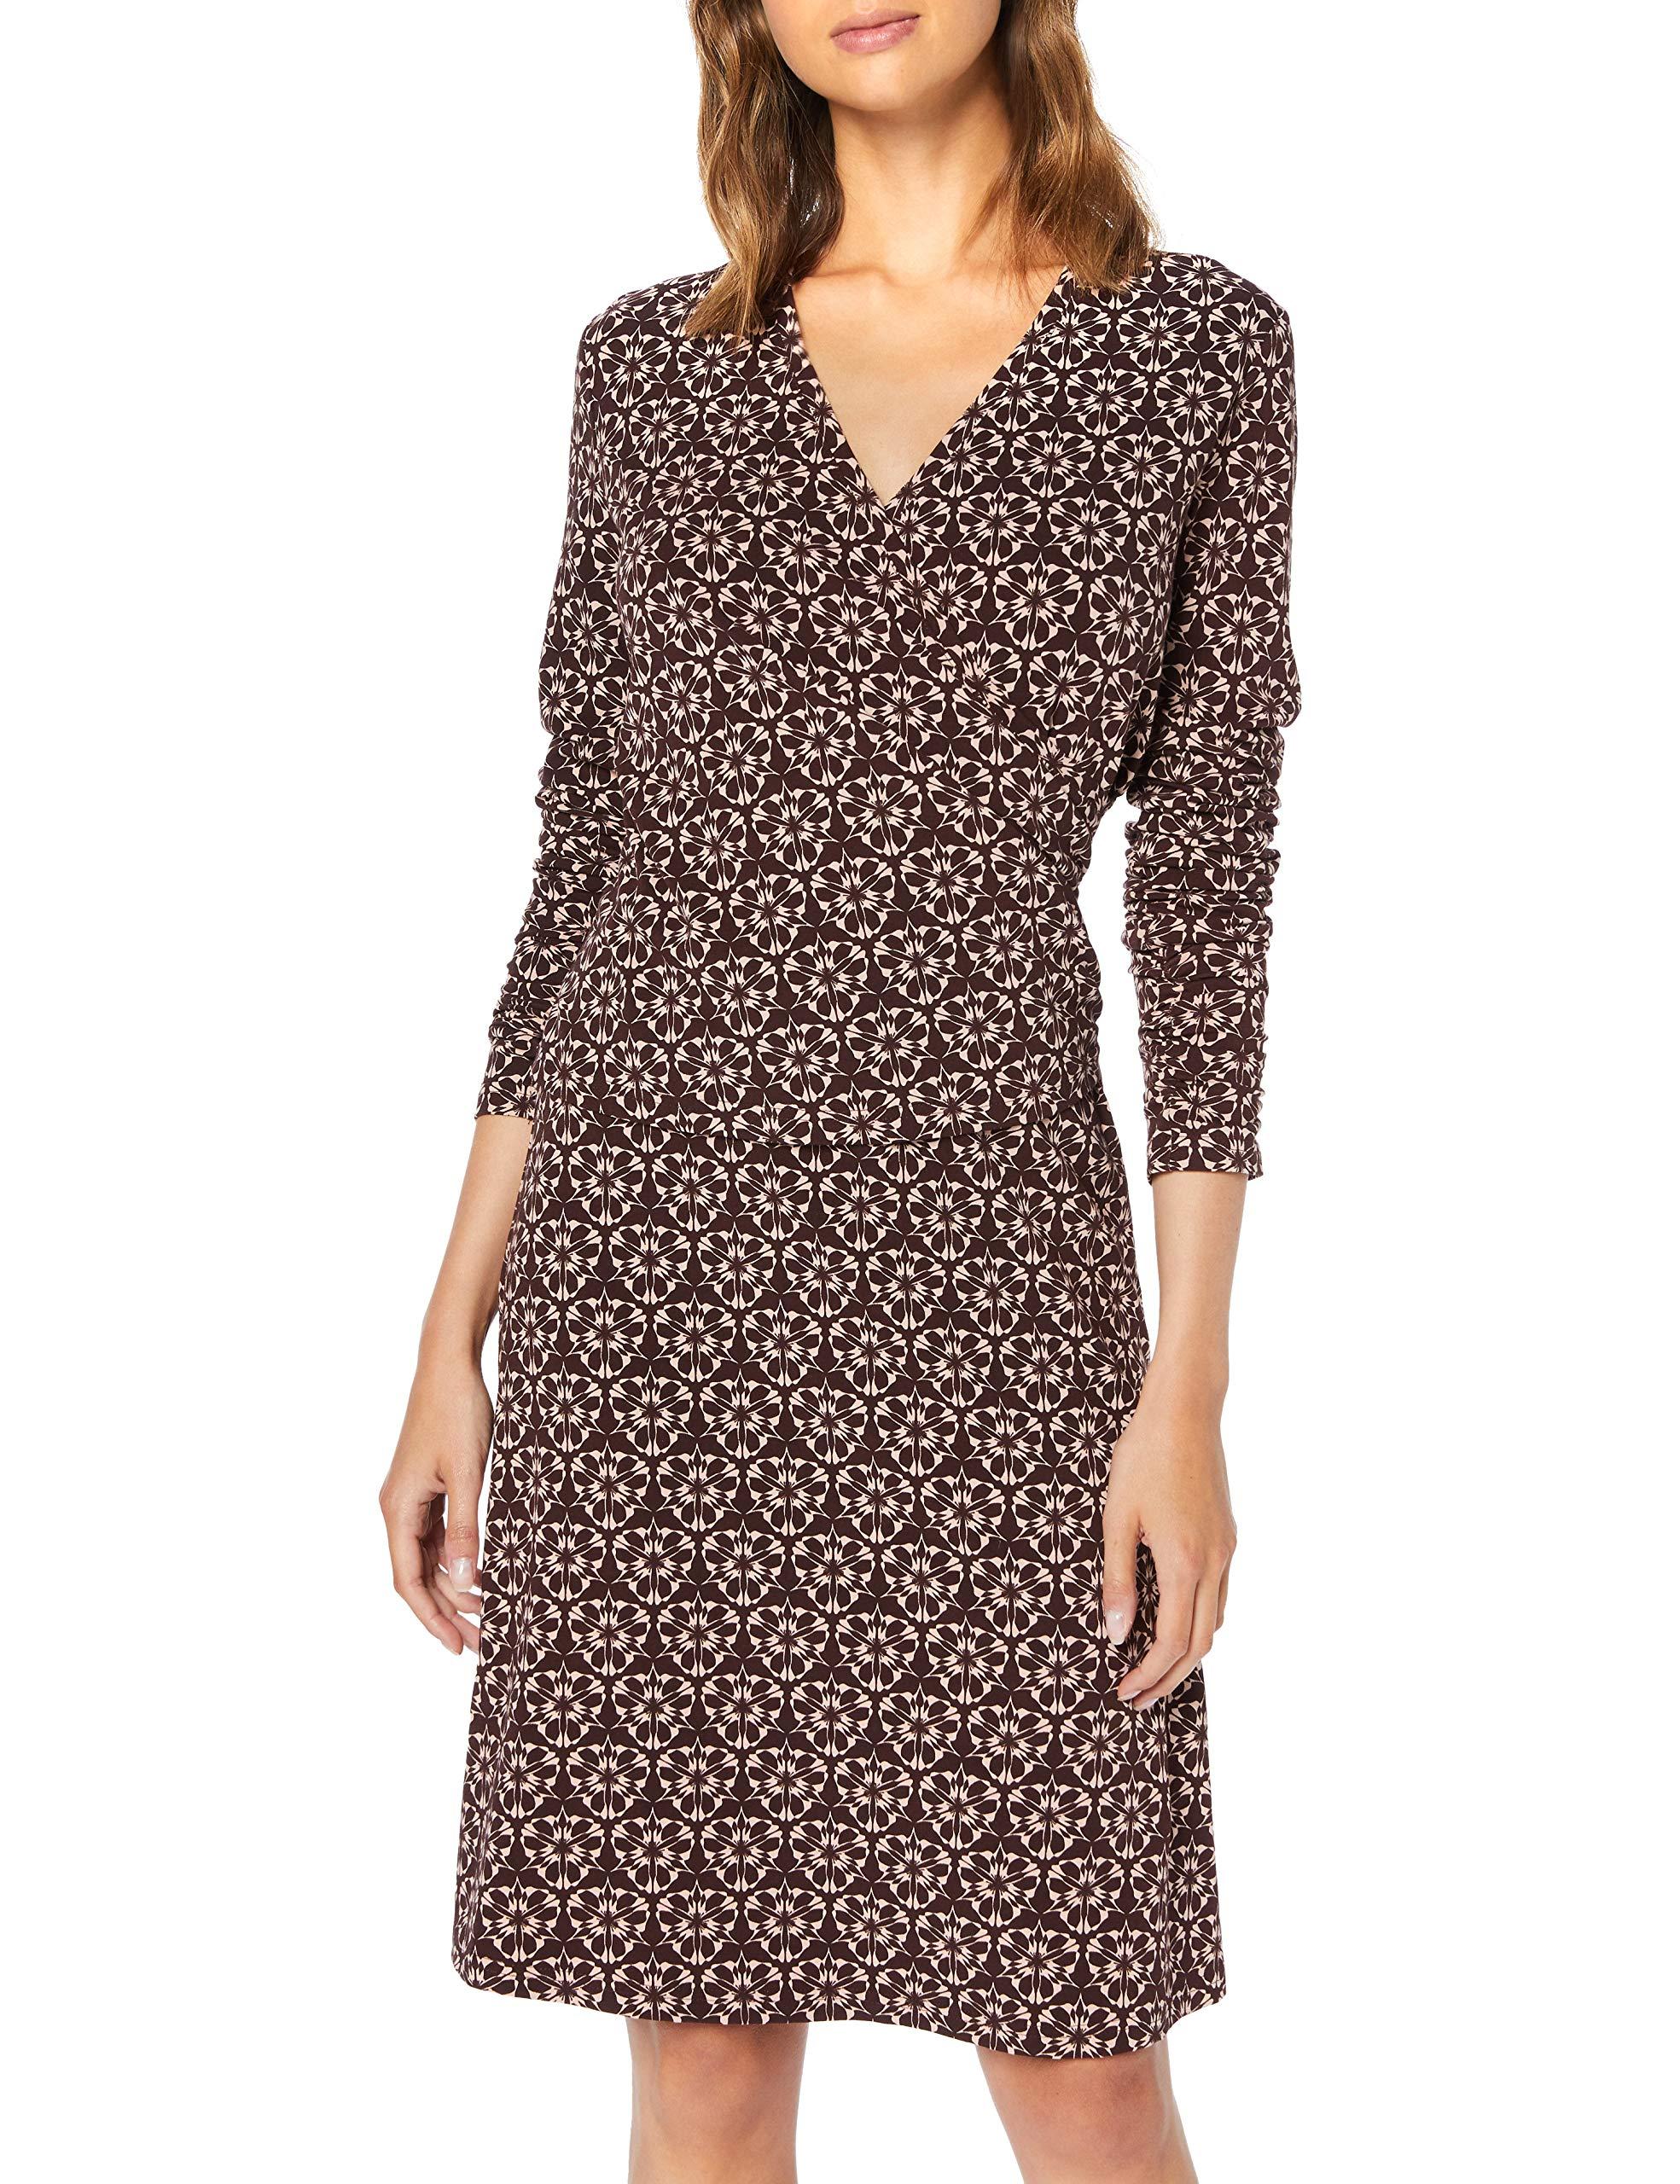 Natural Lana Mei Naturalwear Wear RobeRougeinori Femme Kleid PortroyalSmall 6gy7Ybf